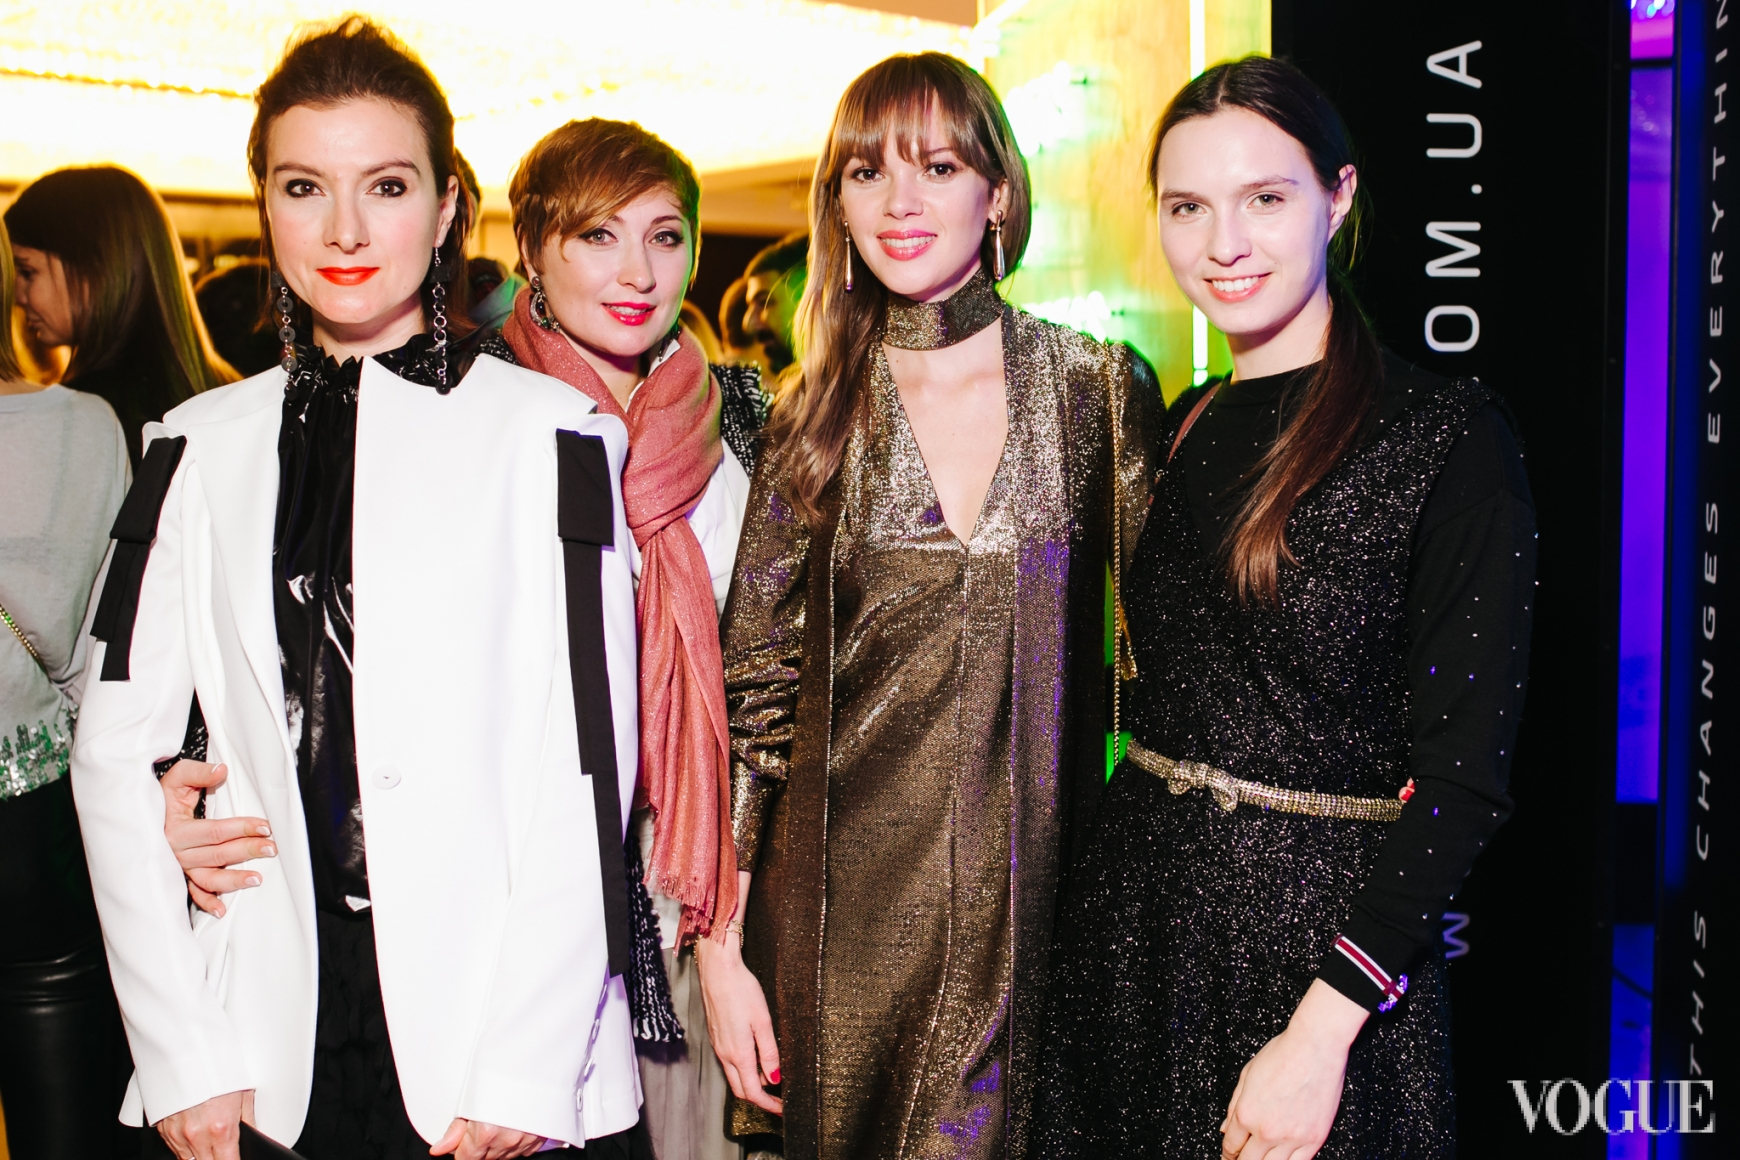 Елена Буренина, Виктория Тигипко, Анастасия Масюткина, Наталья Моденова